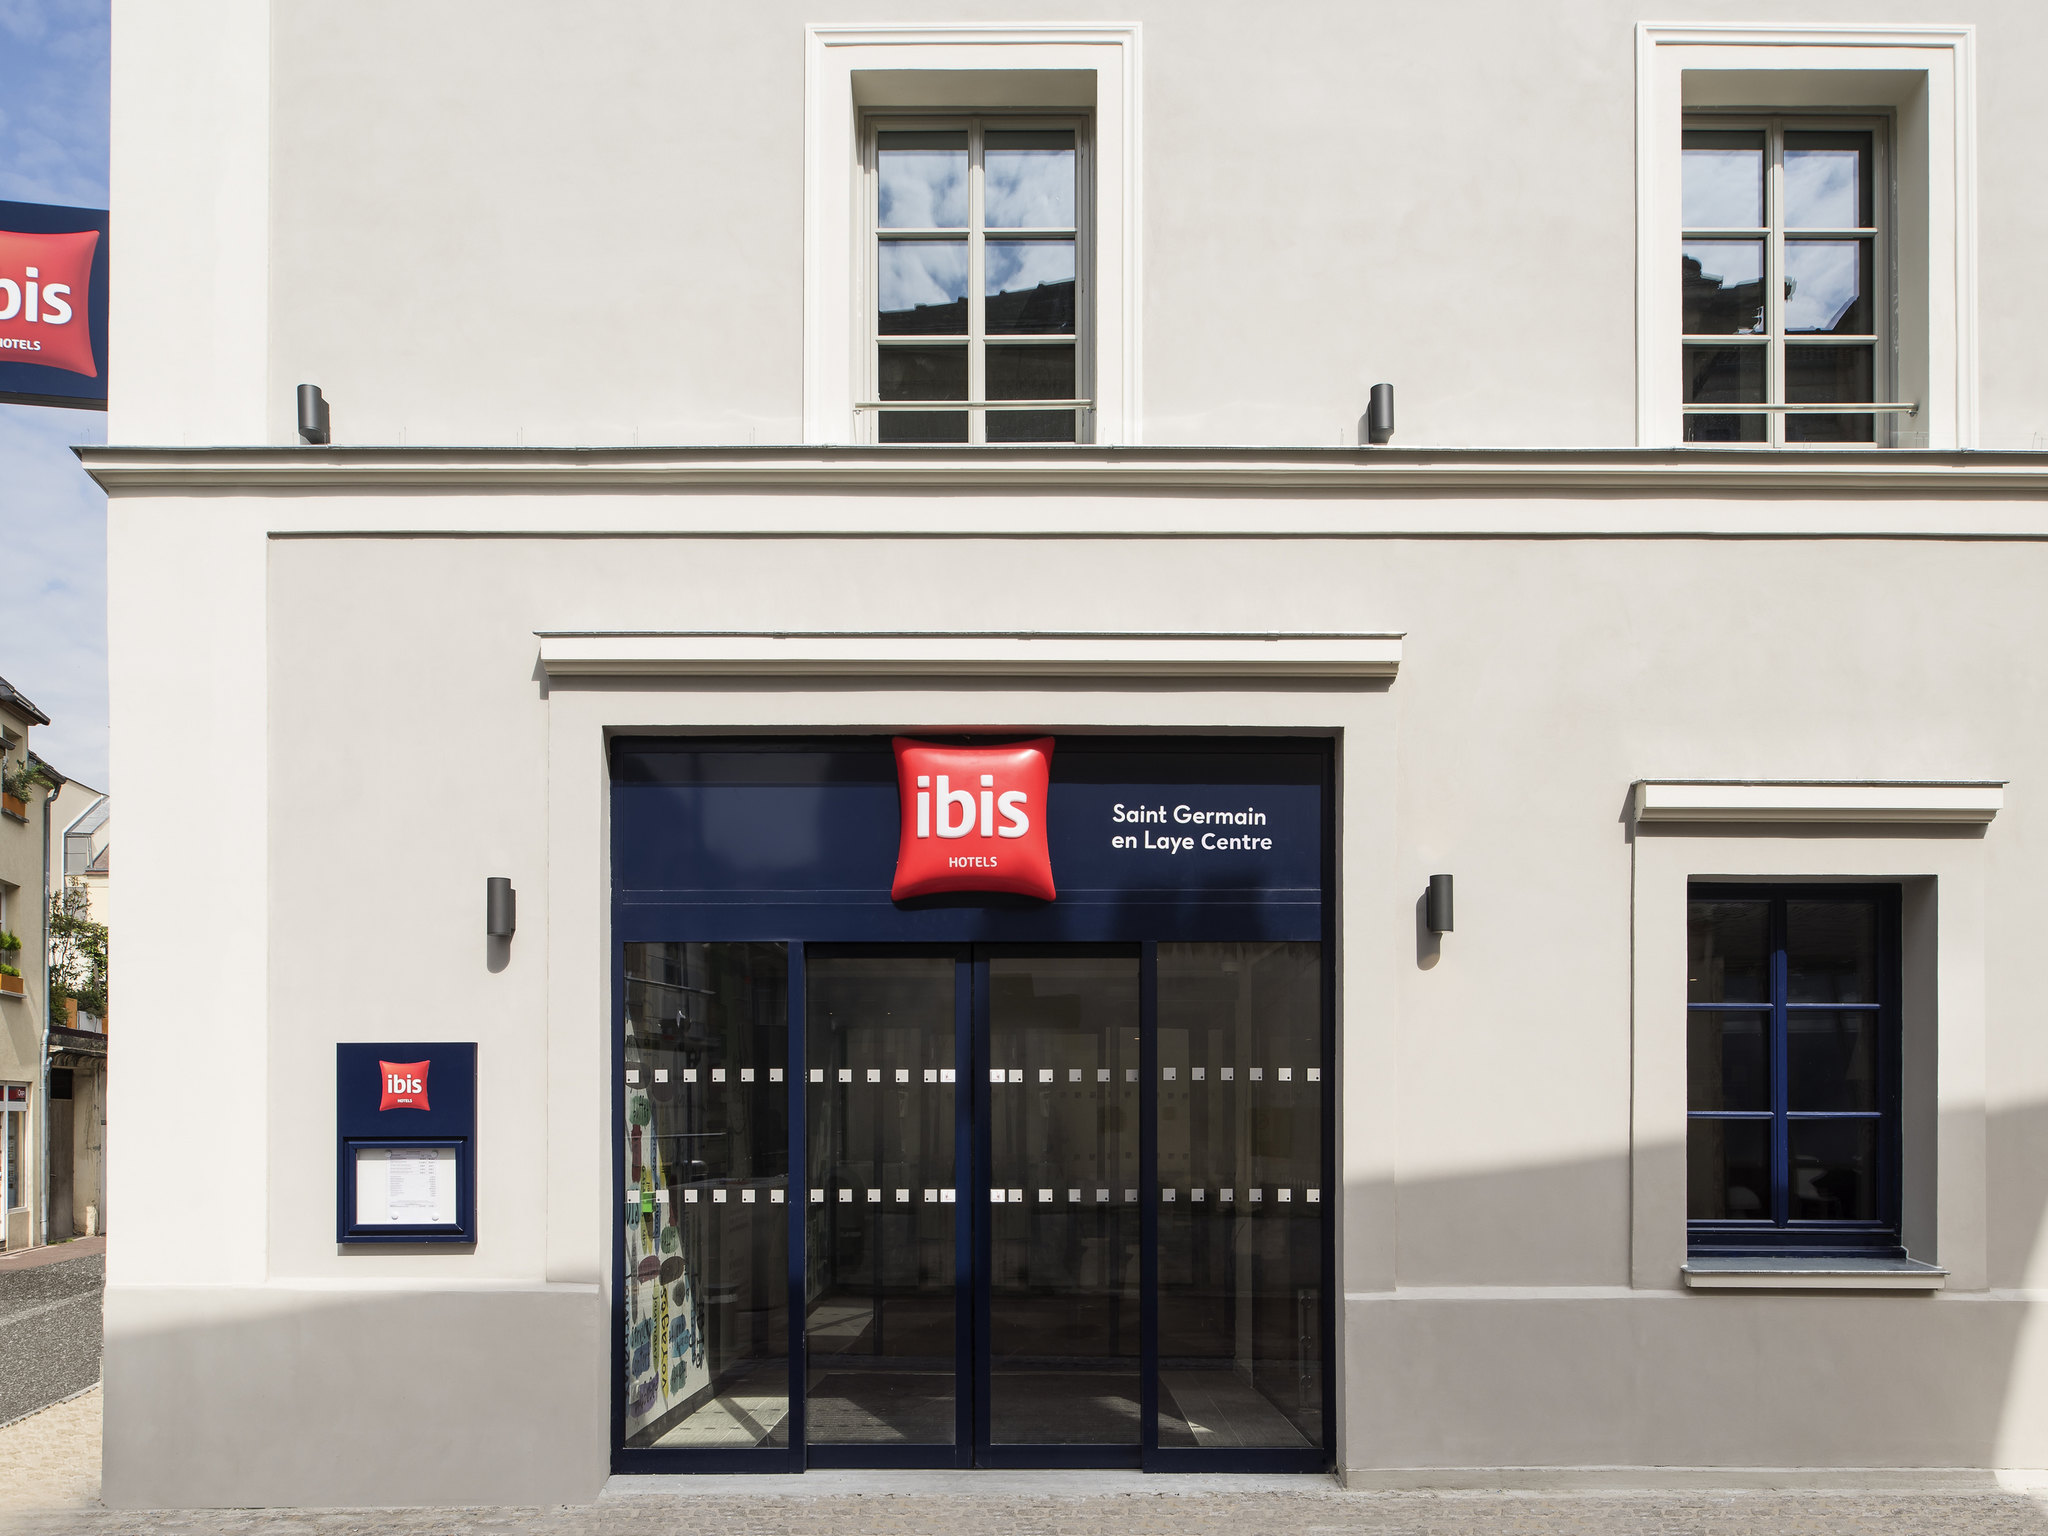 Perfect hotel ibis saint germain en laye centre with for Piscine saint germain en laye salle de sport